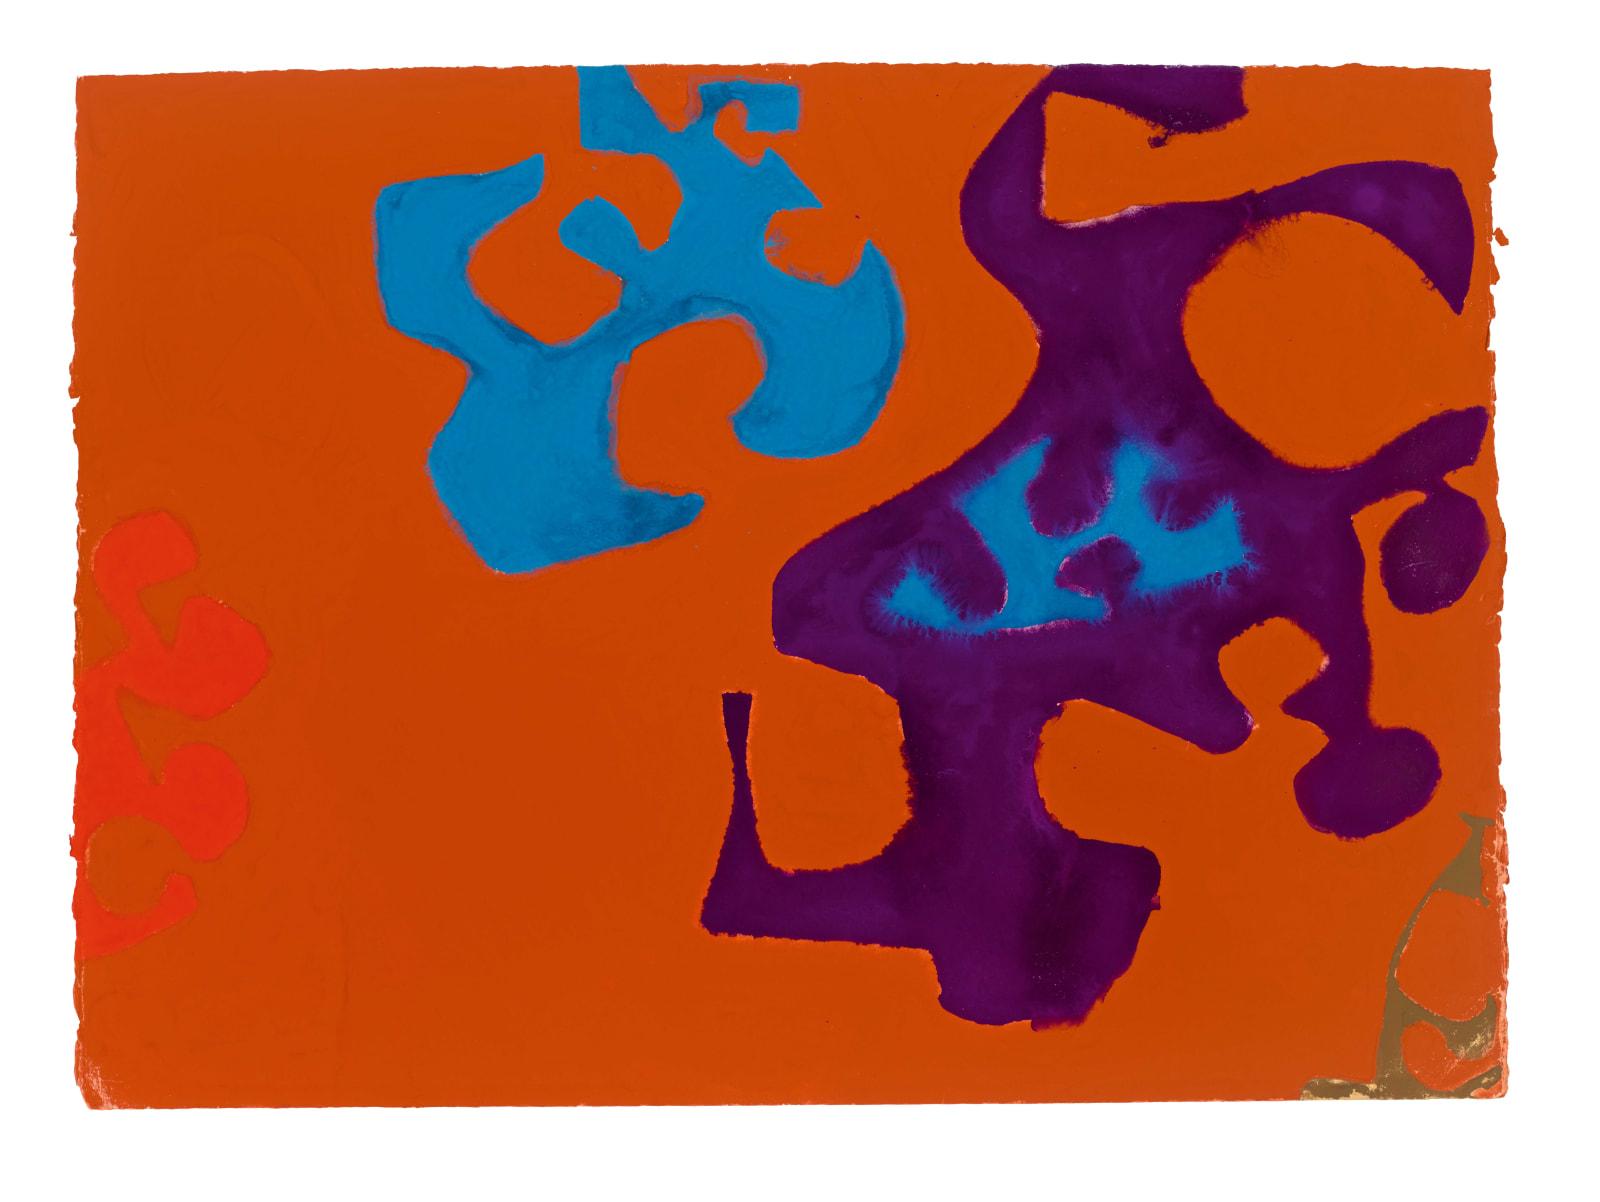 [Untitled 21] , c. 1970